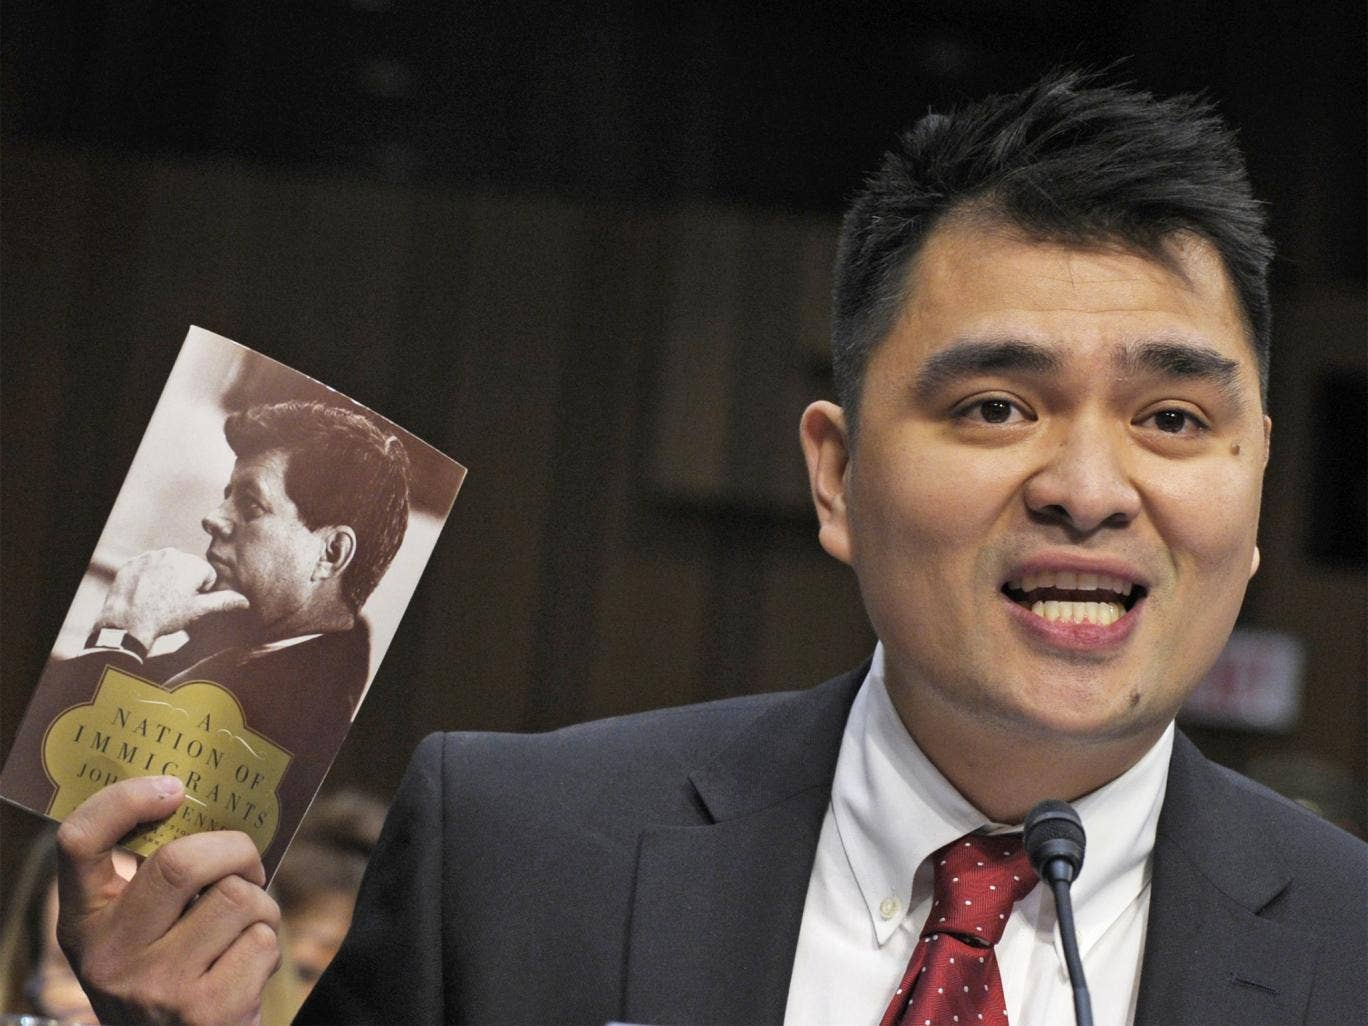 Pulitzer Prize-winning journalist and immigration rights activist, Jose Antonio Vargas